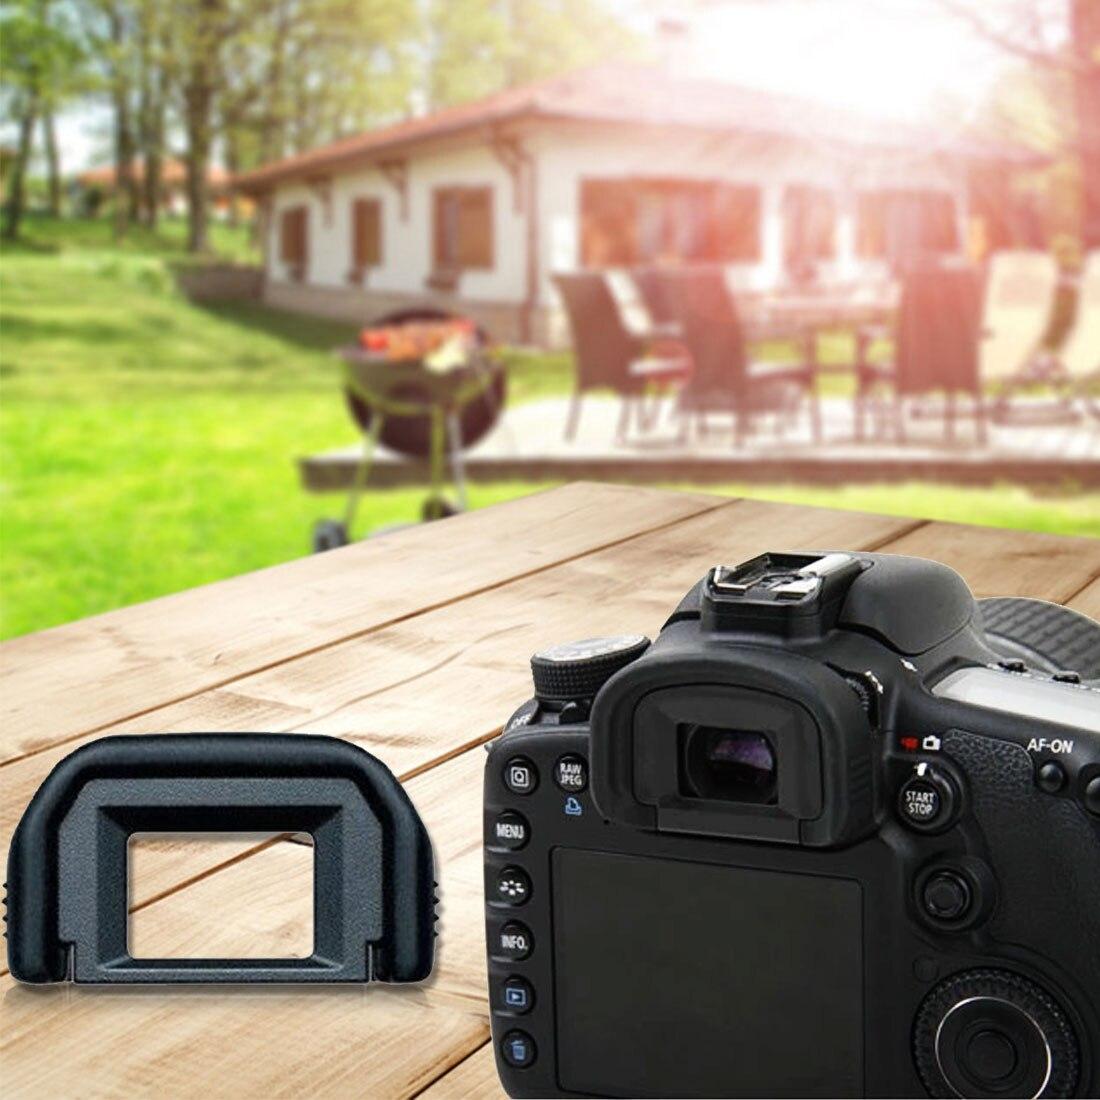 centechia  For EF Viewfinder EF Rubber Eye Cup Eyepiece Eyecup for Canon 650D 600D 550D 500D 450D 1100D 1000D 400D SLR Camera